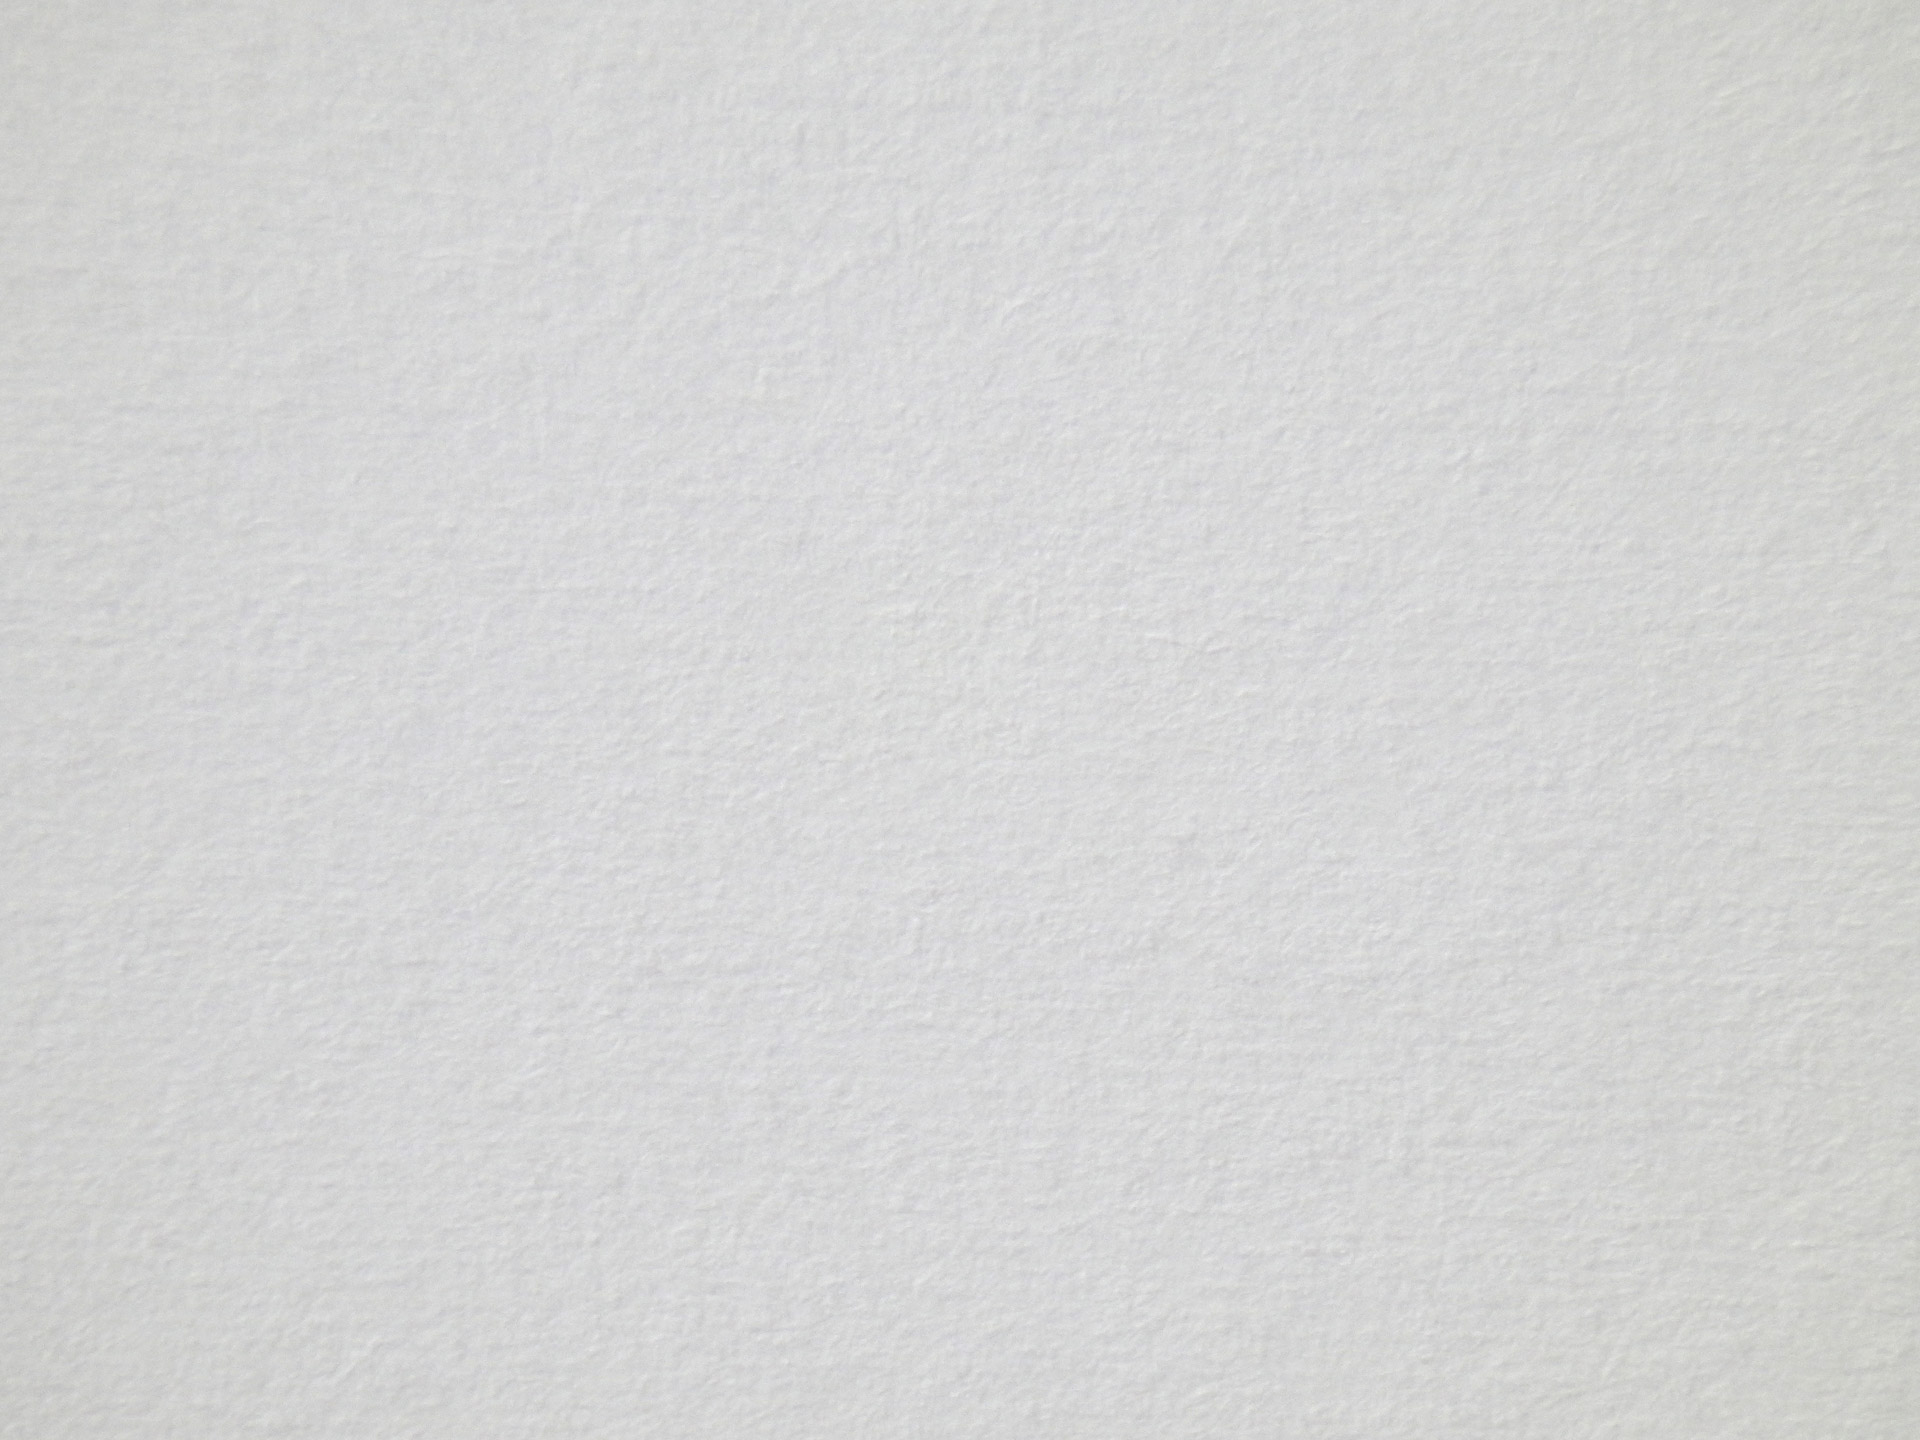 Black Wood Grain Wallpaper Paper Texture Free Stock Photo Public Domain Pictures